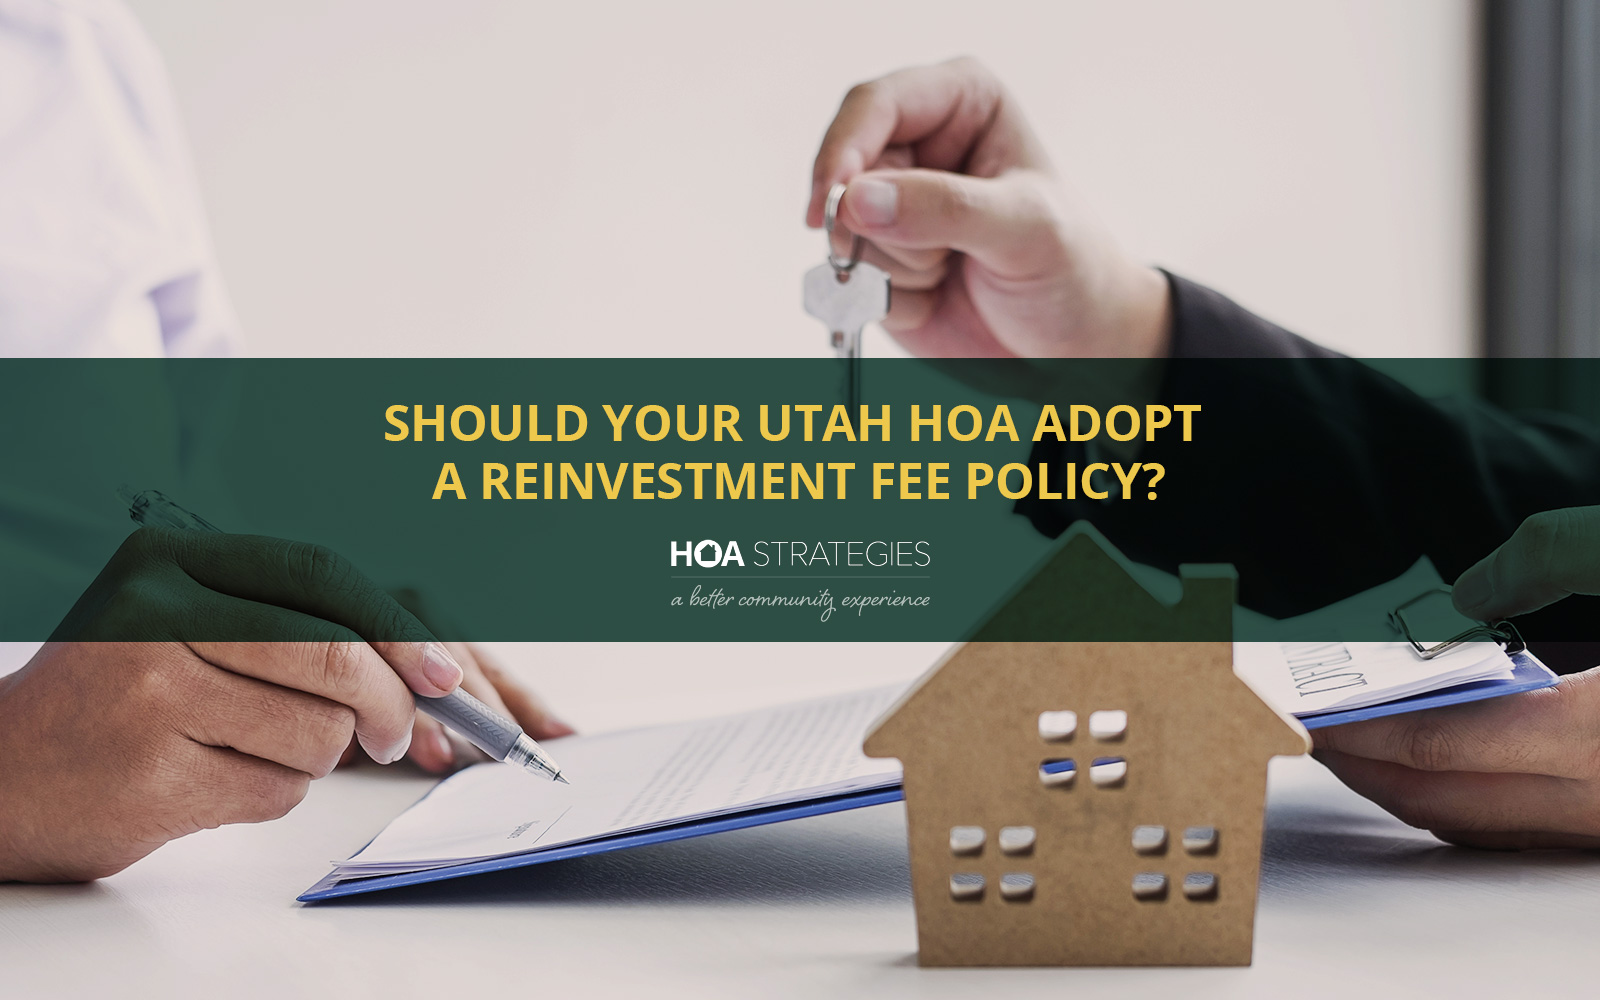 Utah HOA Rinvestment Fee Policy